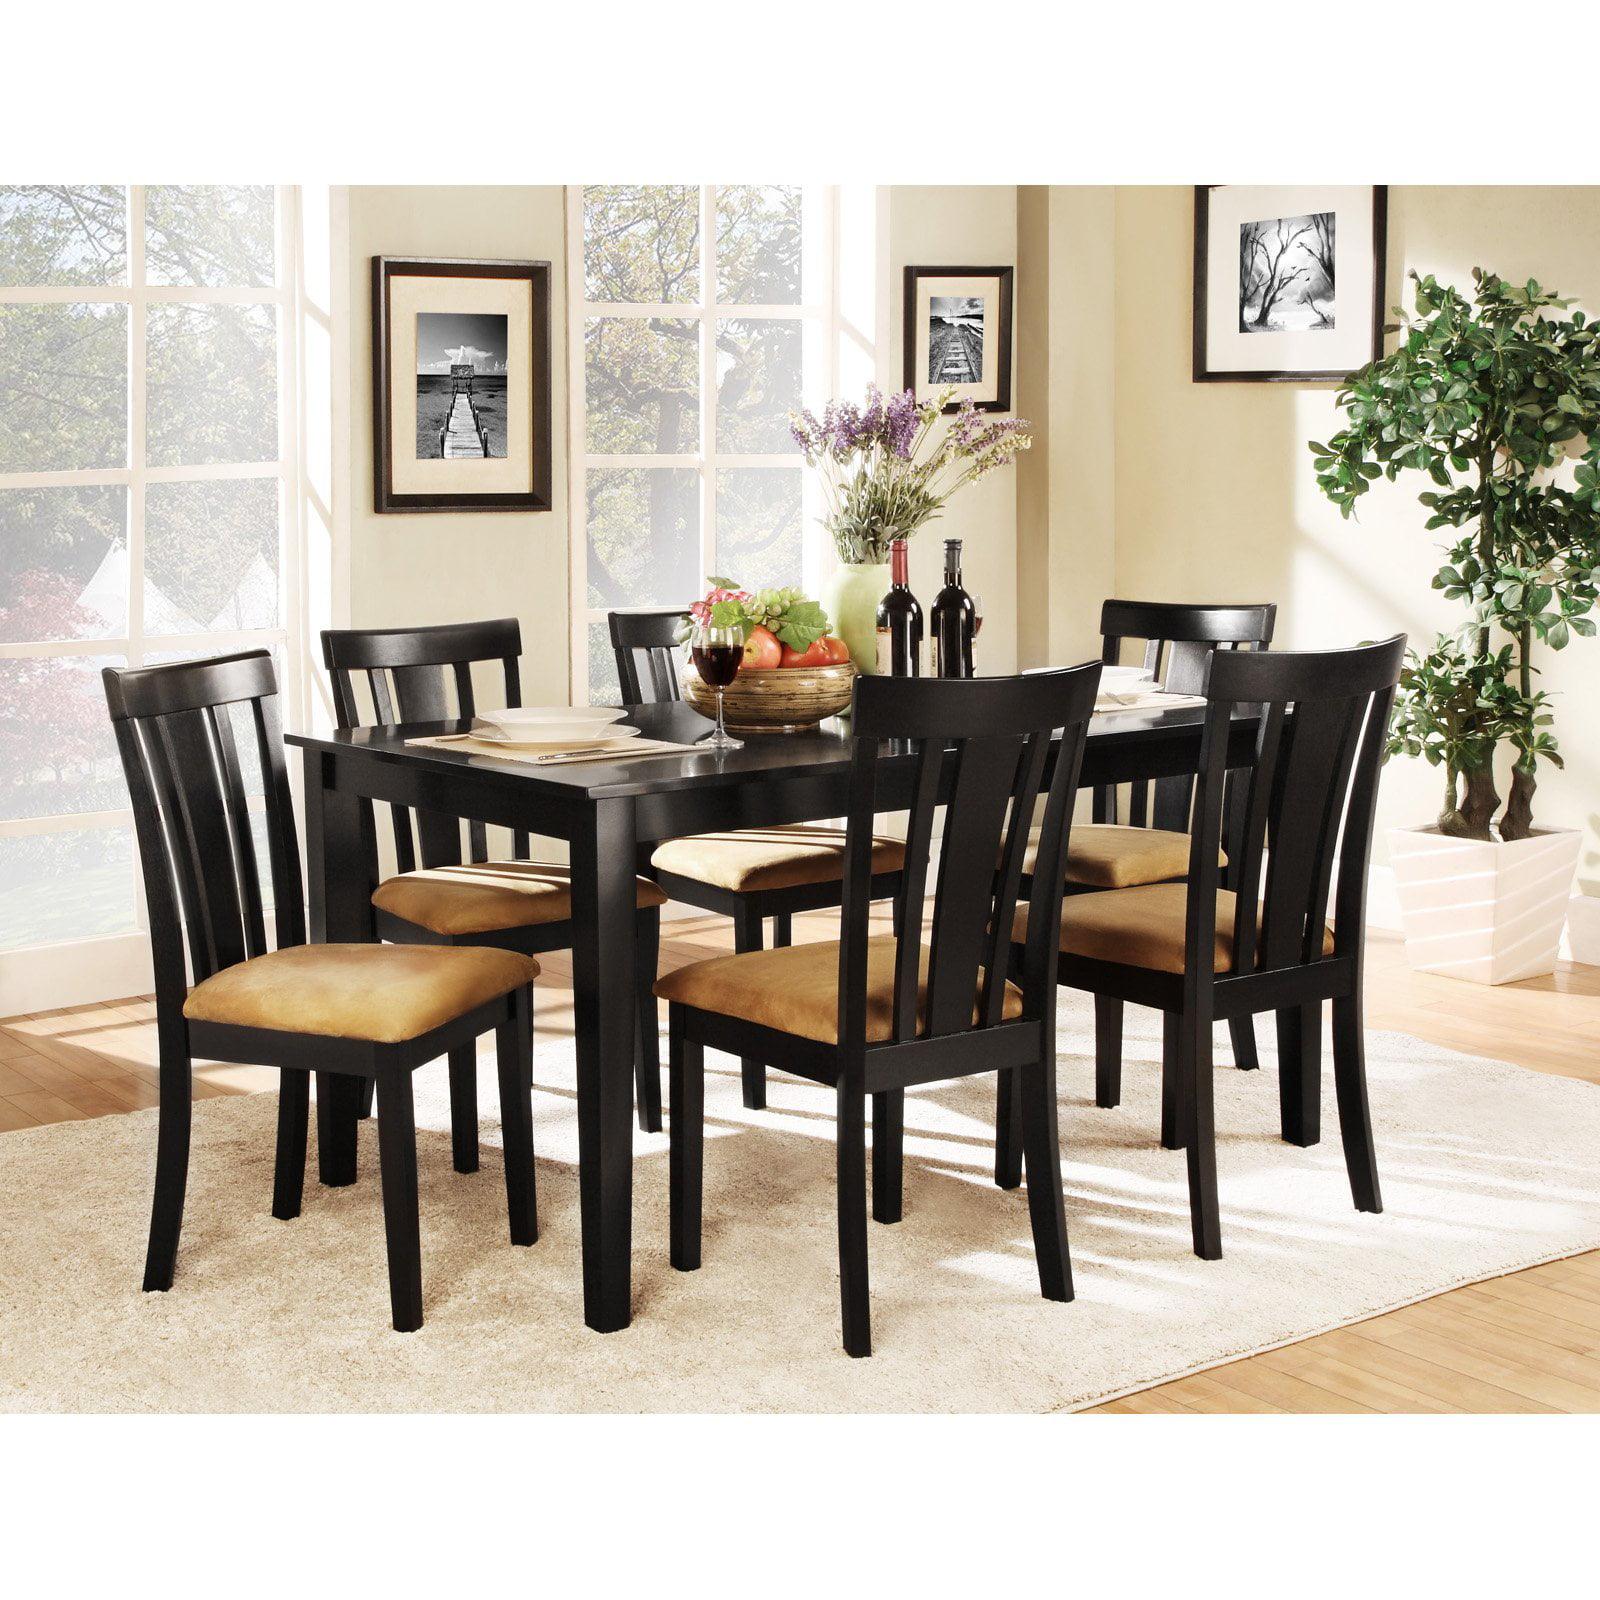 Homelegance Tibalt 7 Piece Rectangle Black Dining Table ...